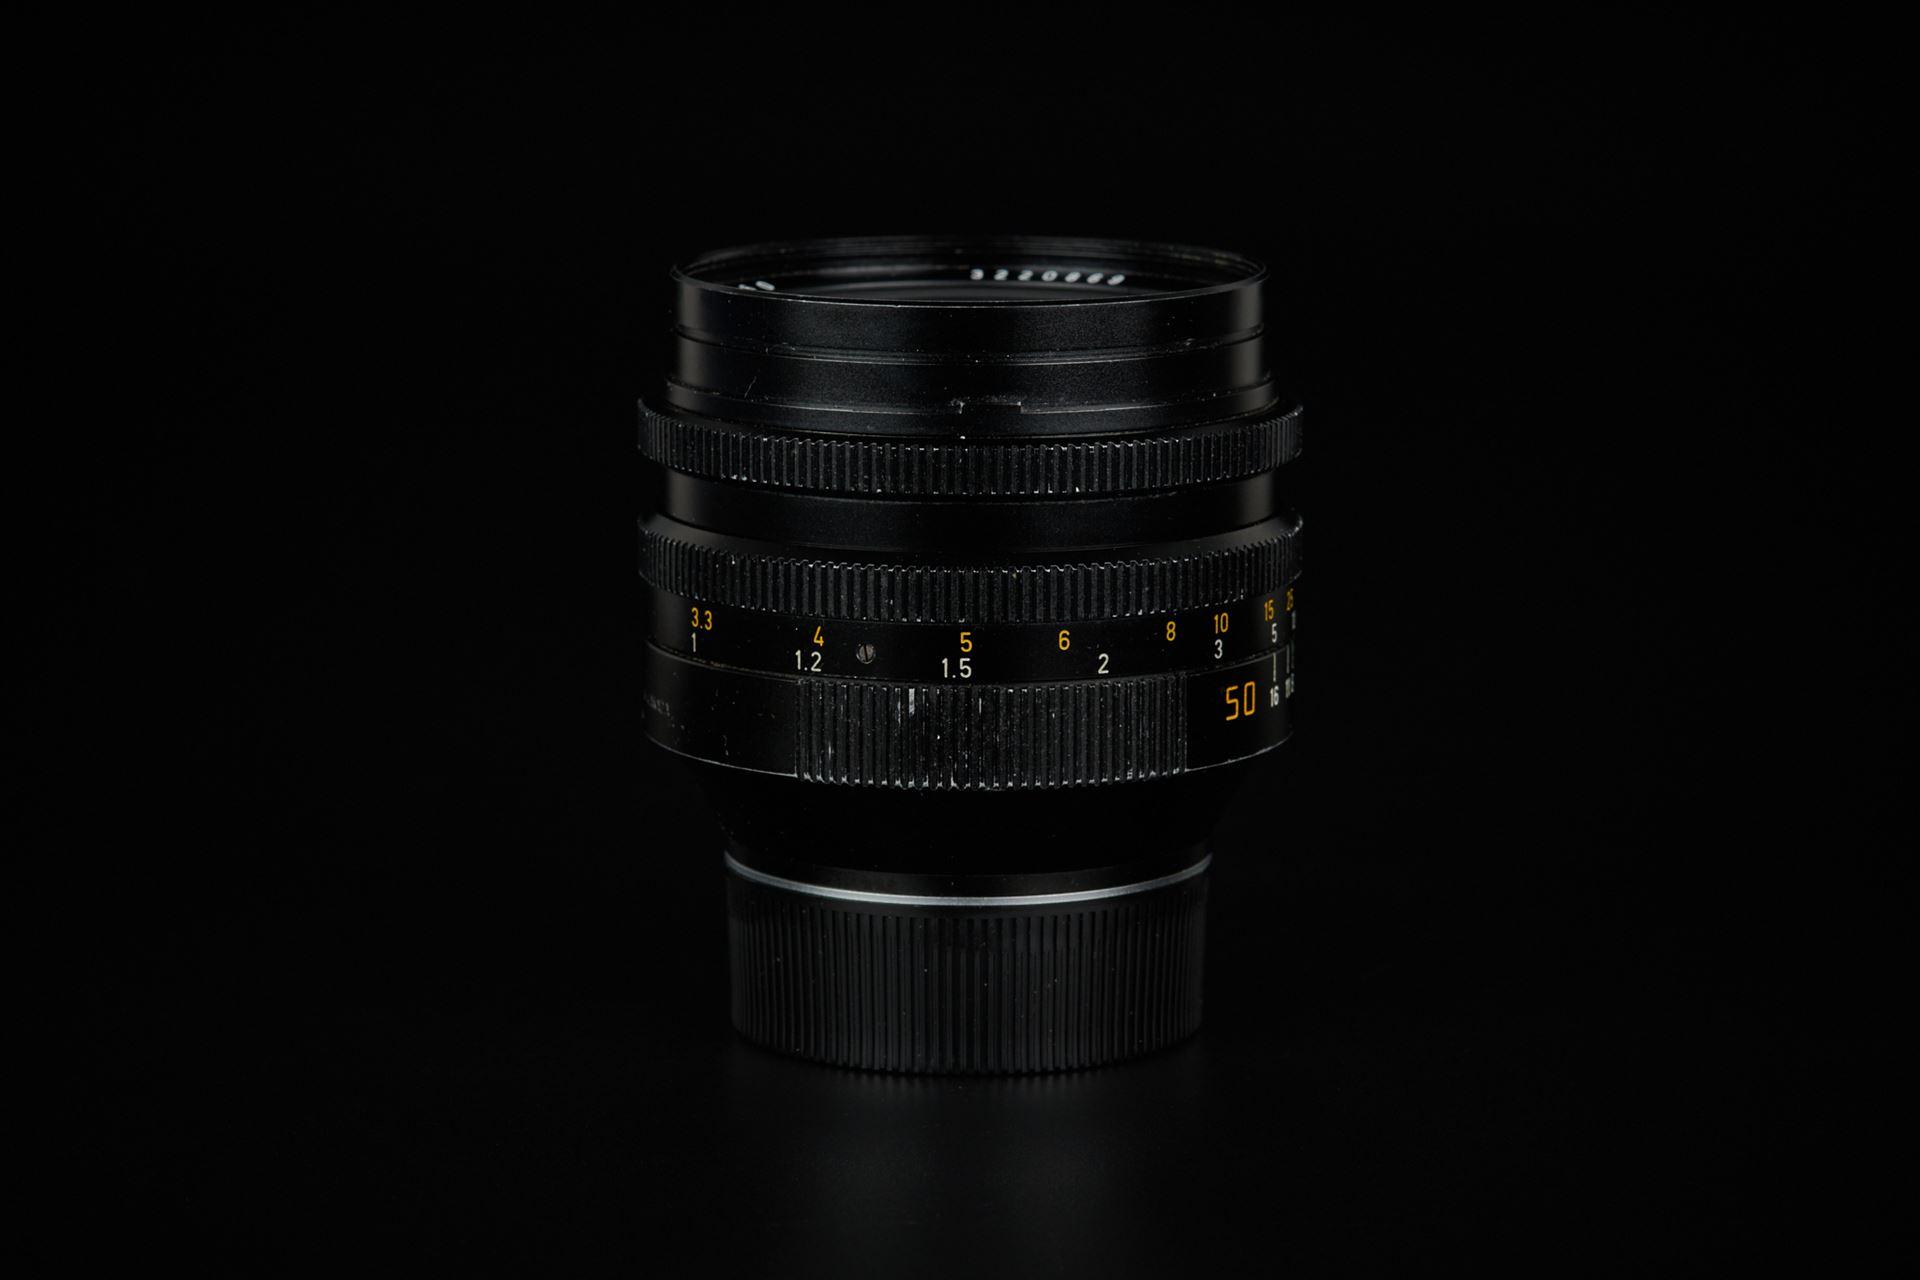 Picture of leica noctilux-m 50mm f/1 ver.3